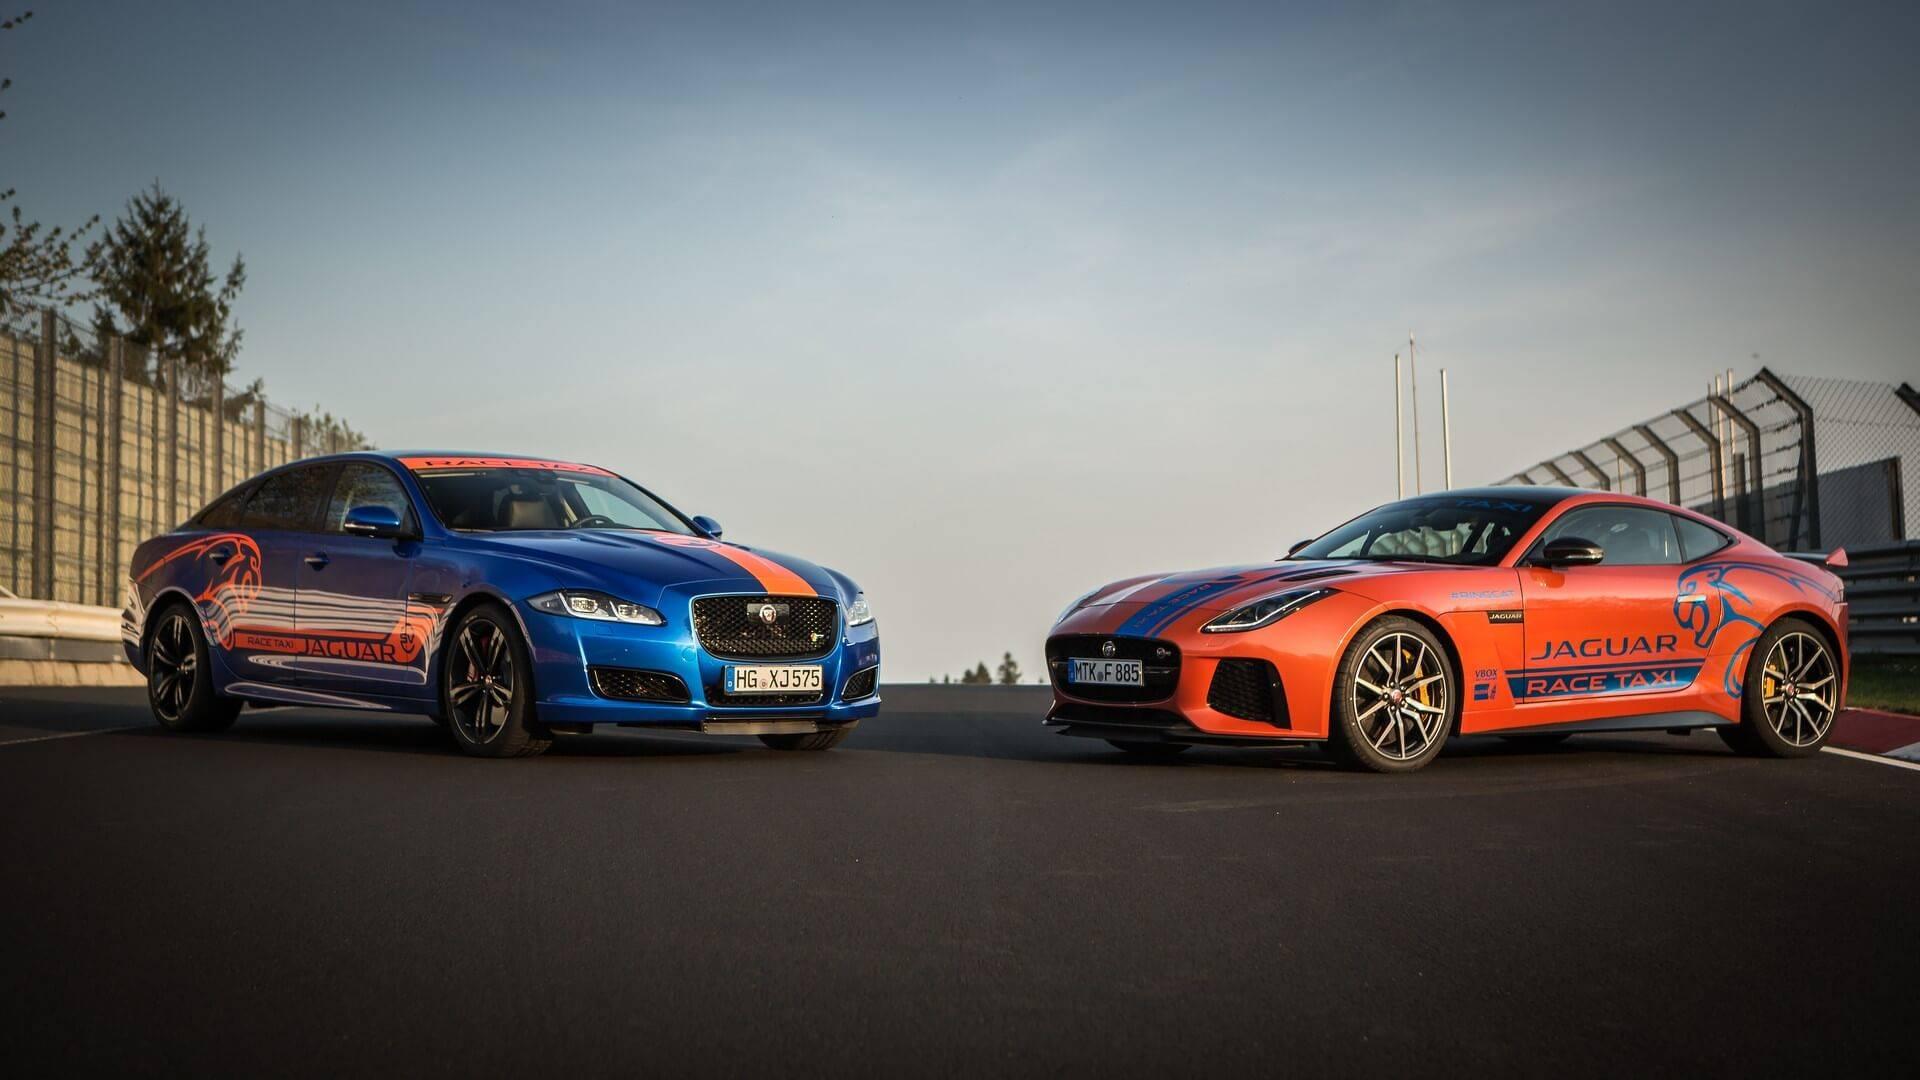 Jaguar_Nurburgring_taxi_0002